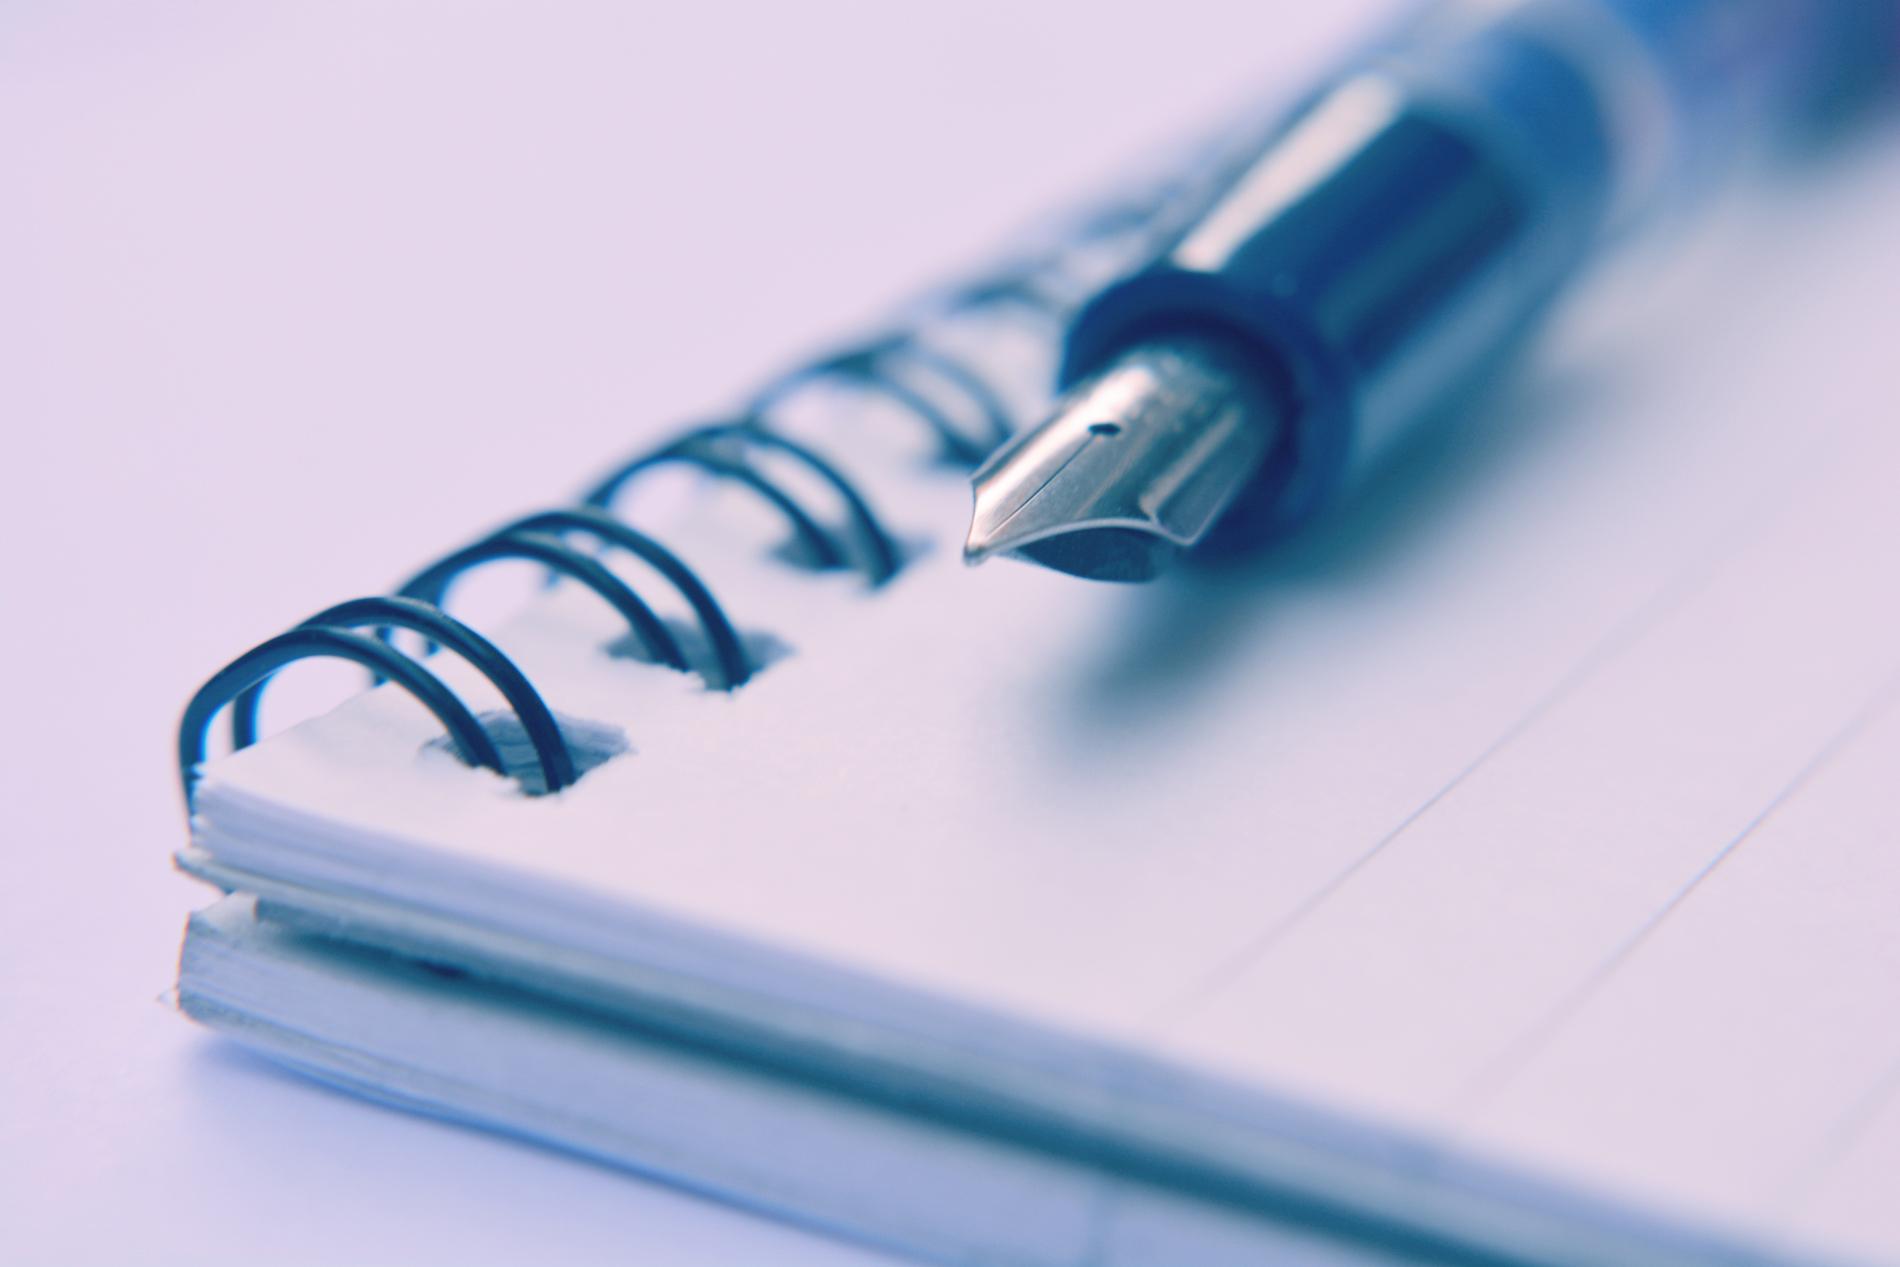 ink-pen-on-scribble-pad